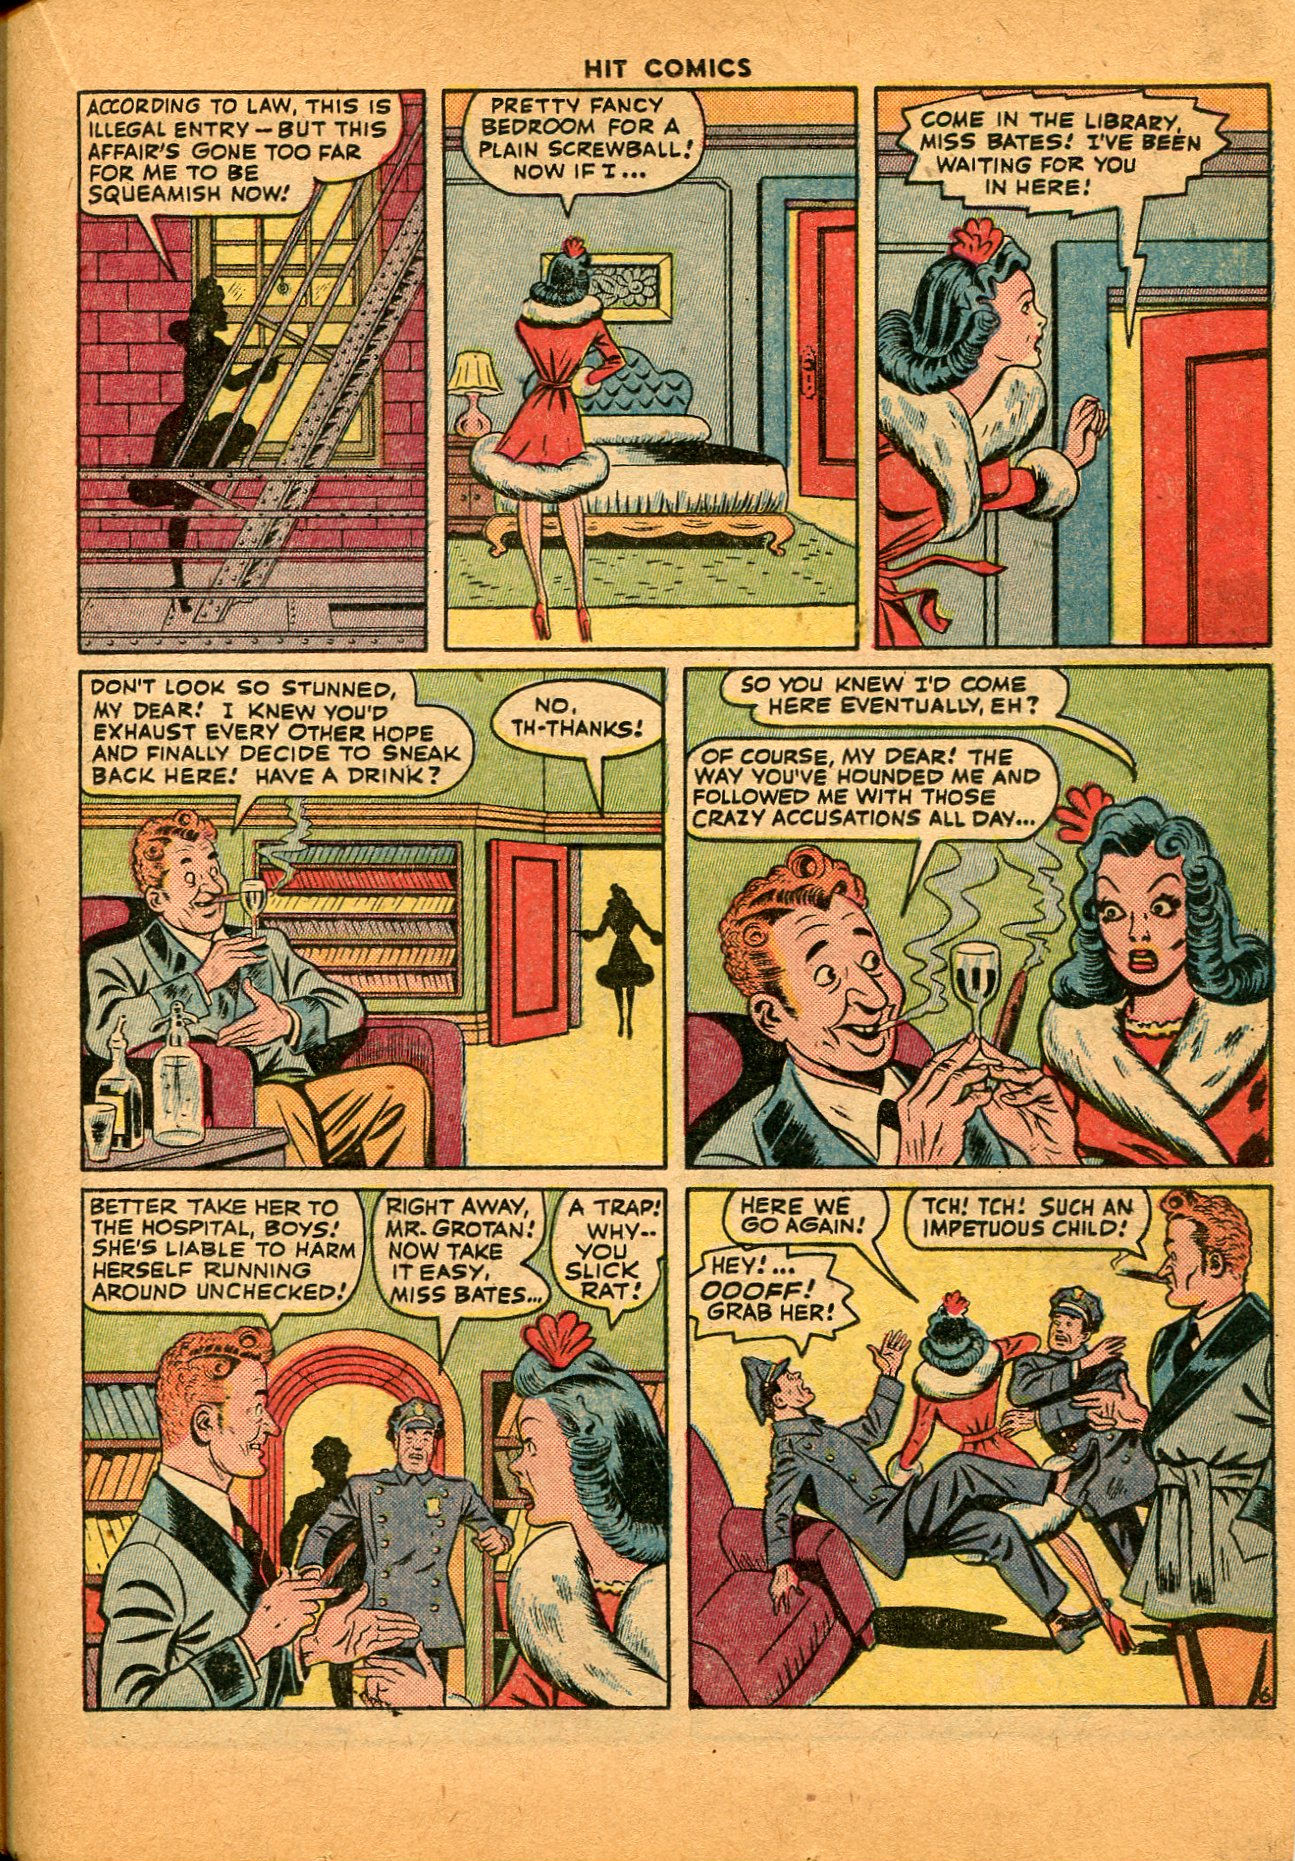 Read online Hit Comics comic -  Issue #35 - 35